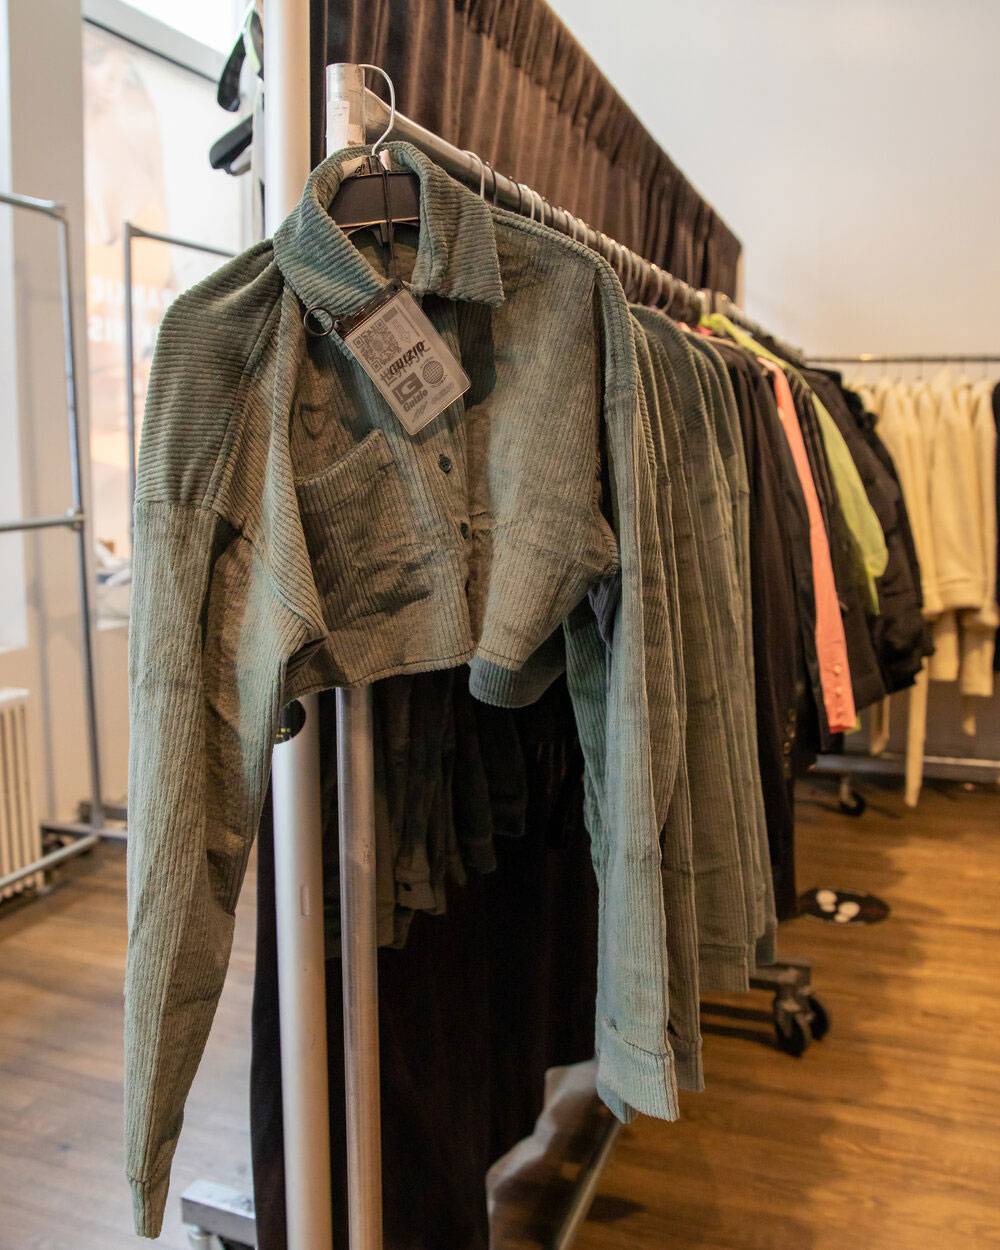 Danielle Guizio Sample Sale in Images